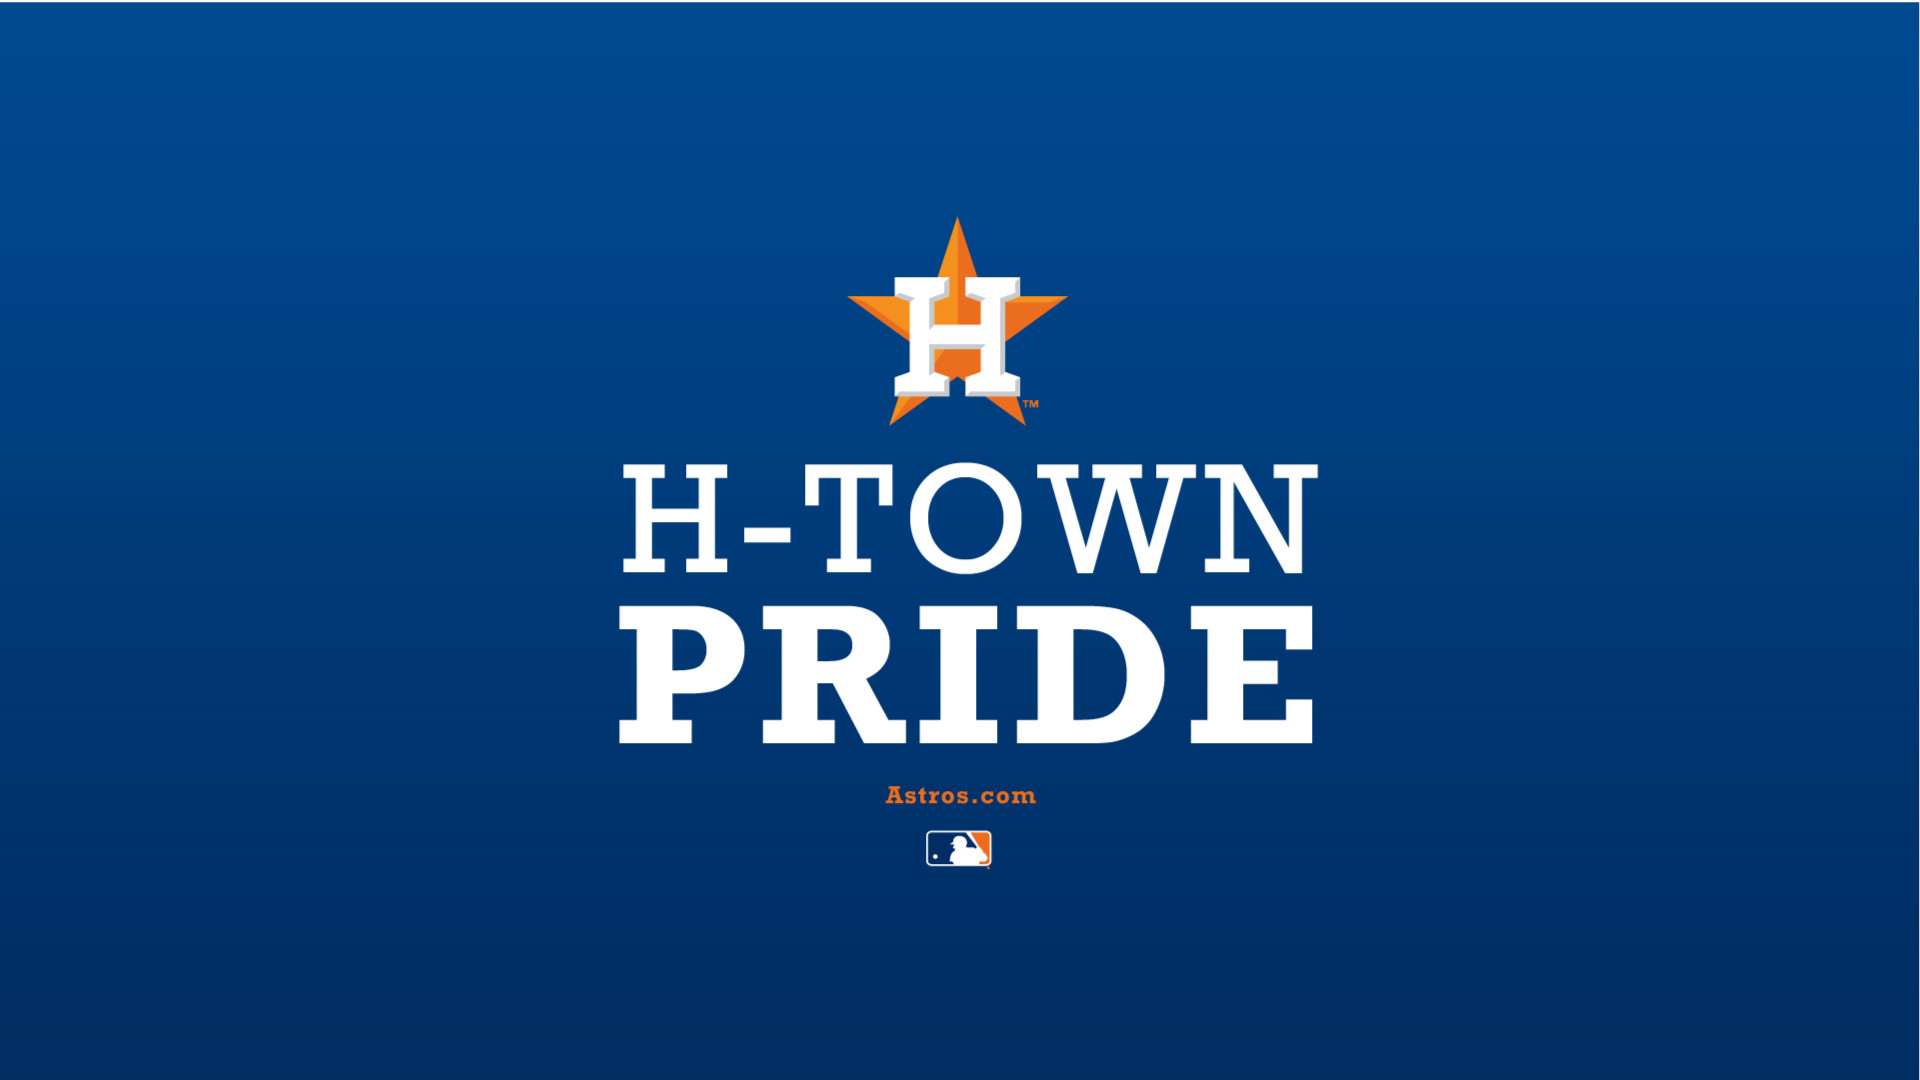 … Wallpaper HD; Pride Astros Baseball Walpaper HD